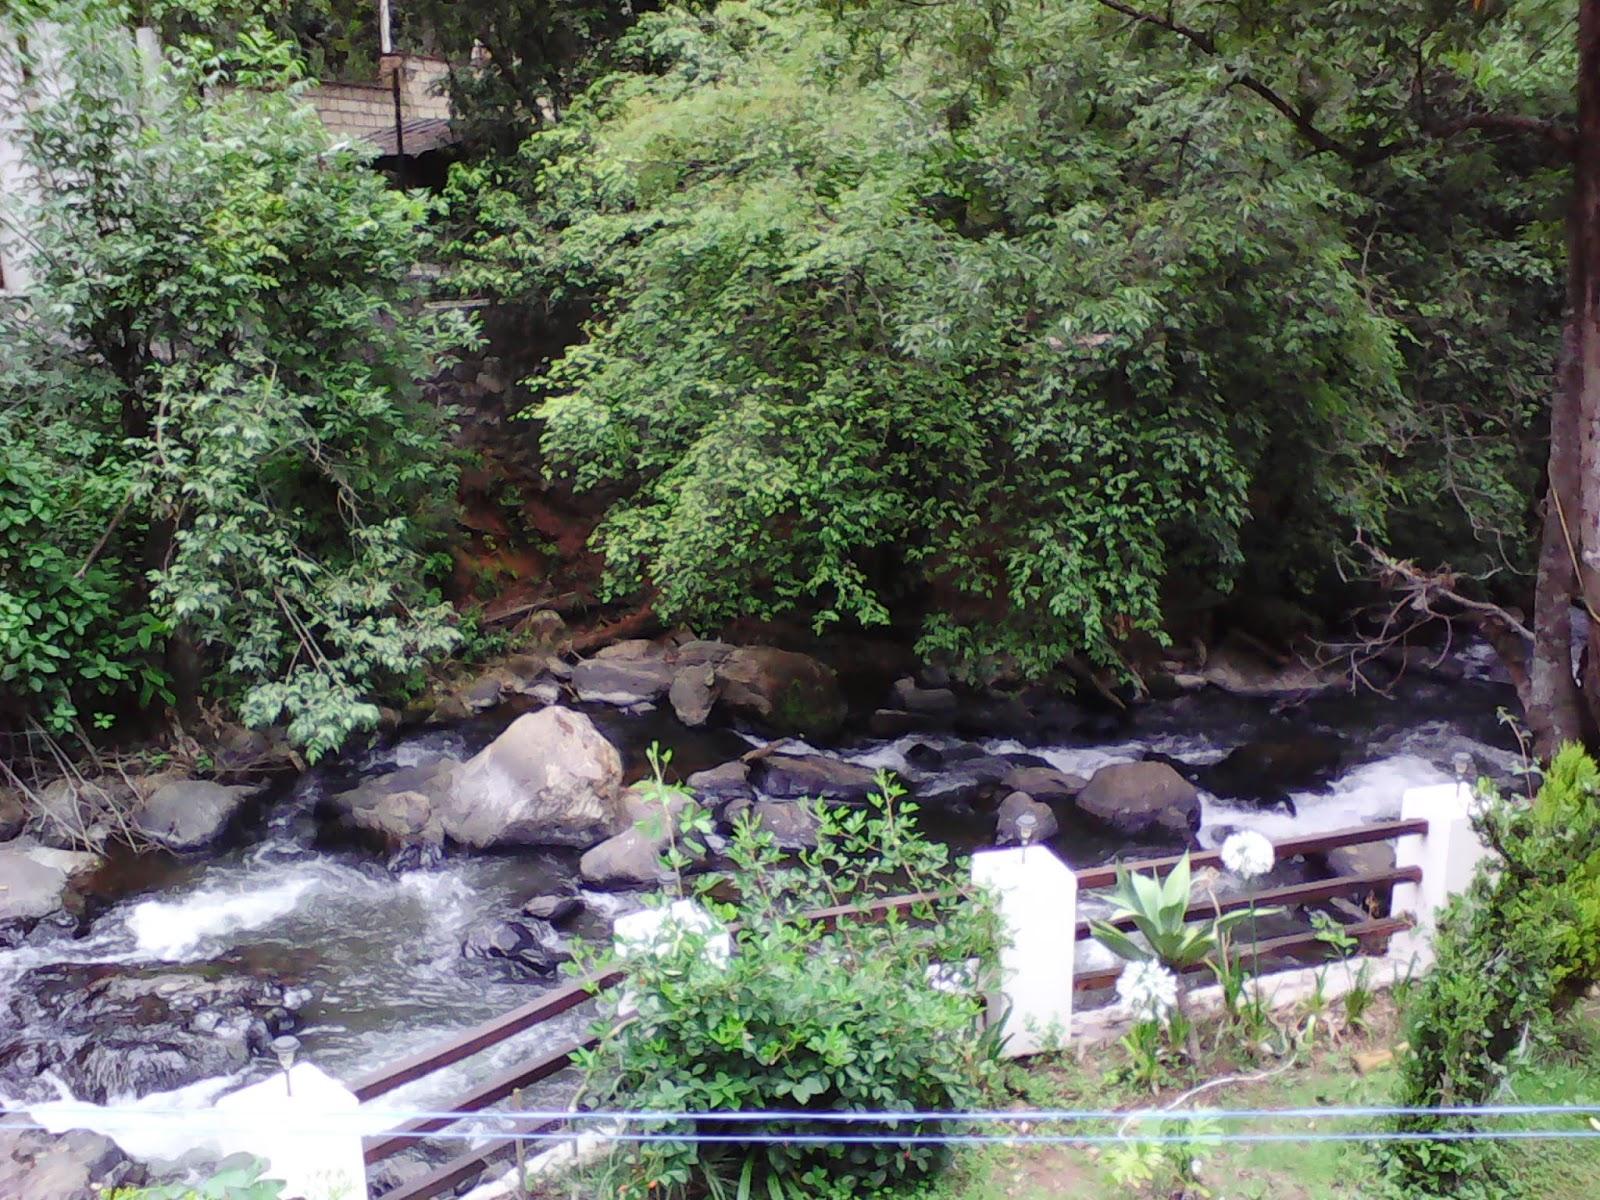 Valle de Bravo. Cascadas del Molino y Velo de Novia